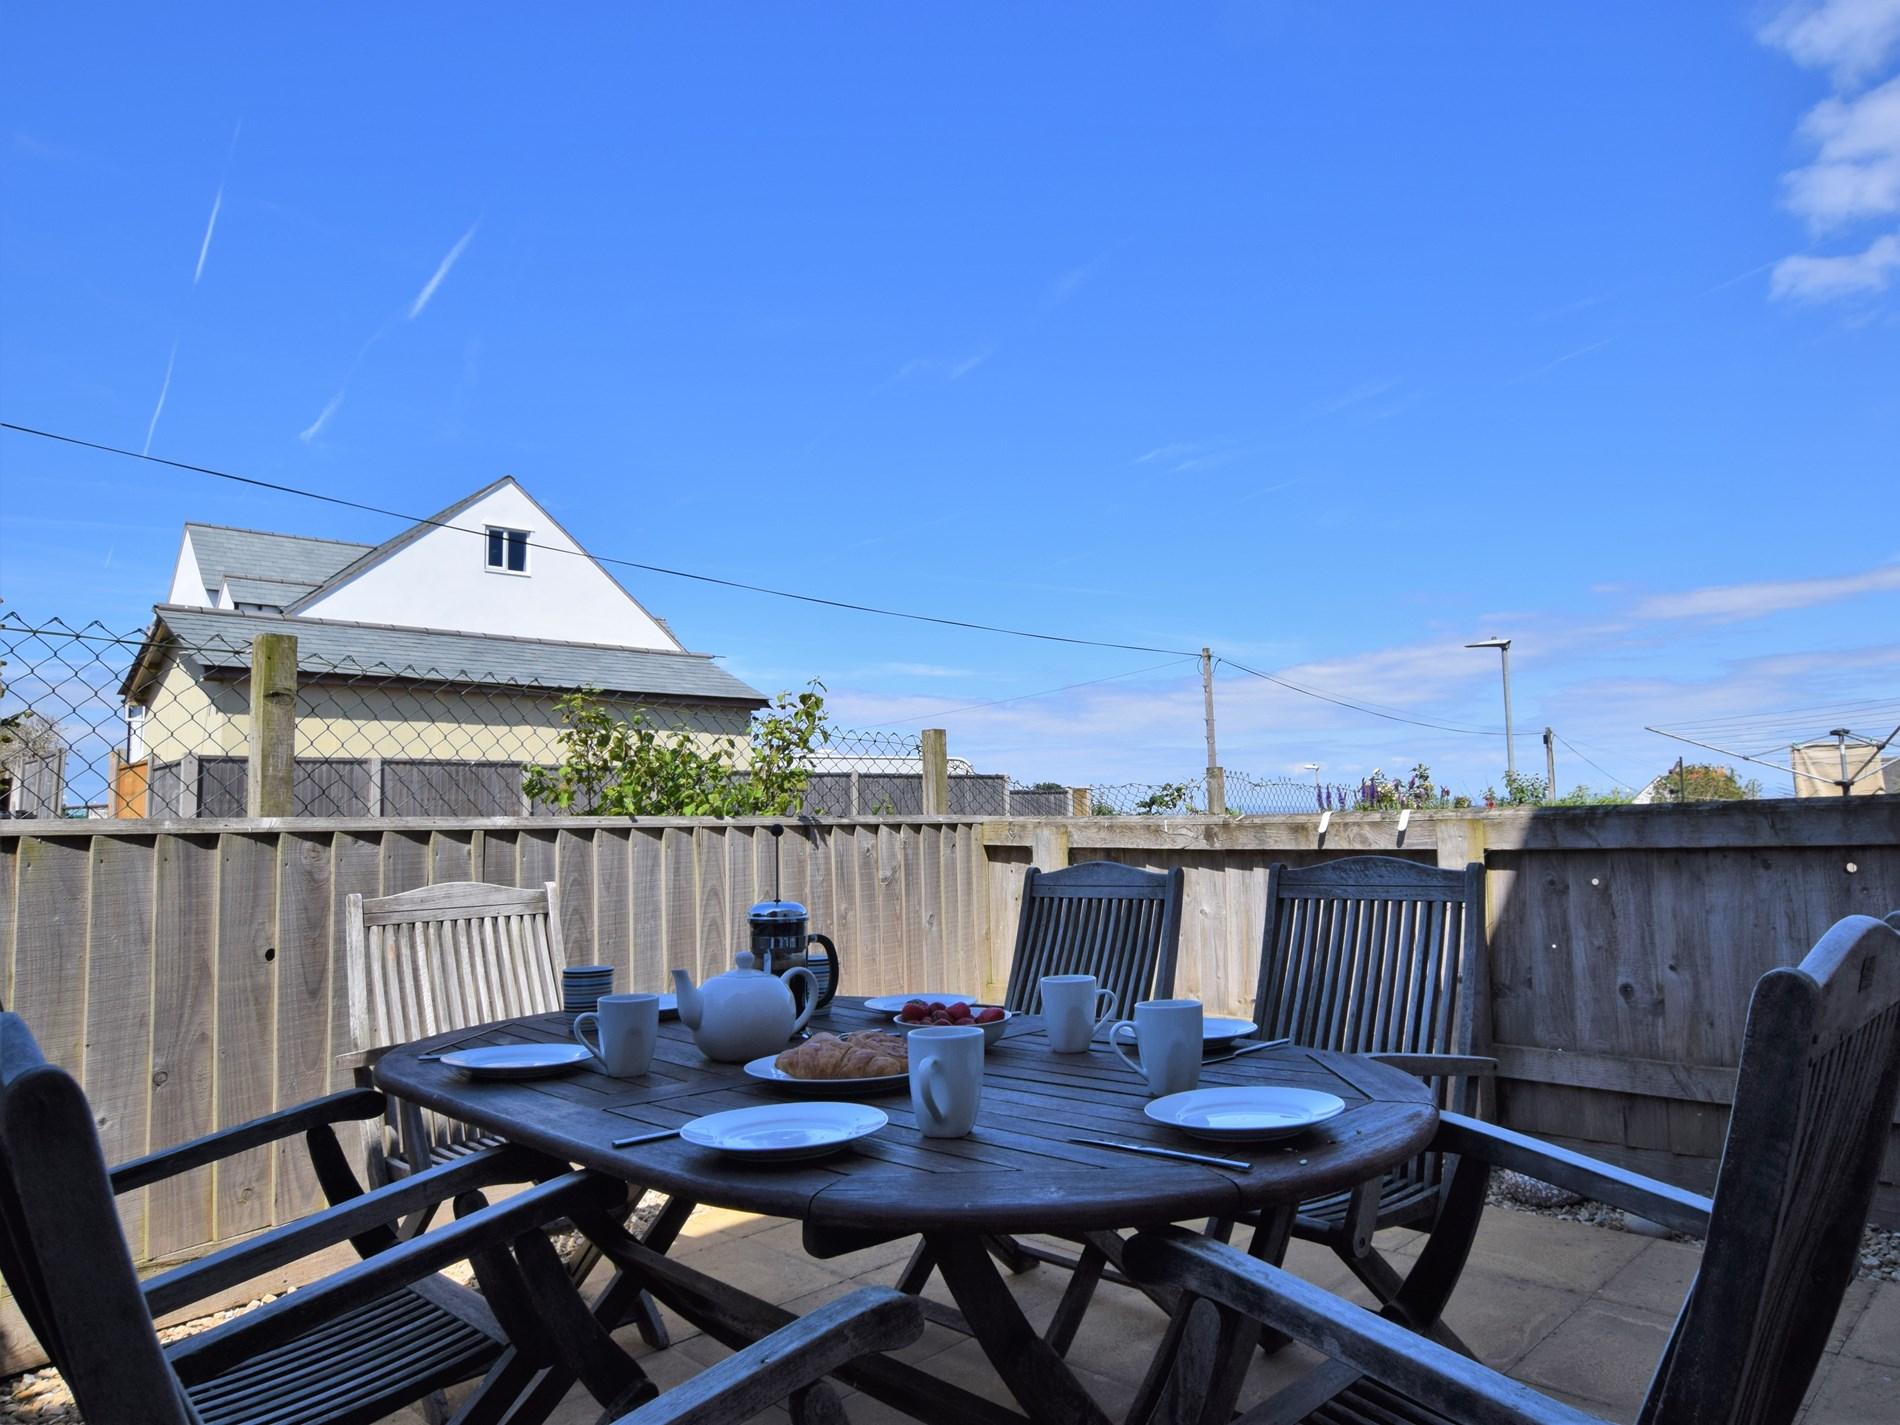 Sunny rear patio area with sea views to enjoy